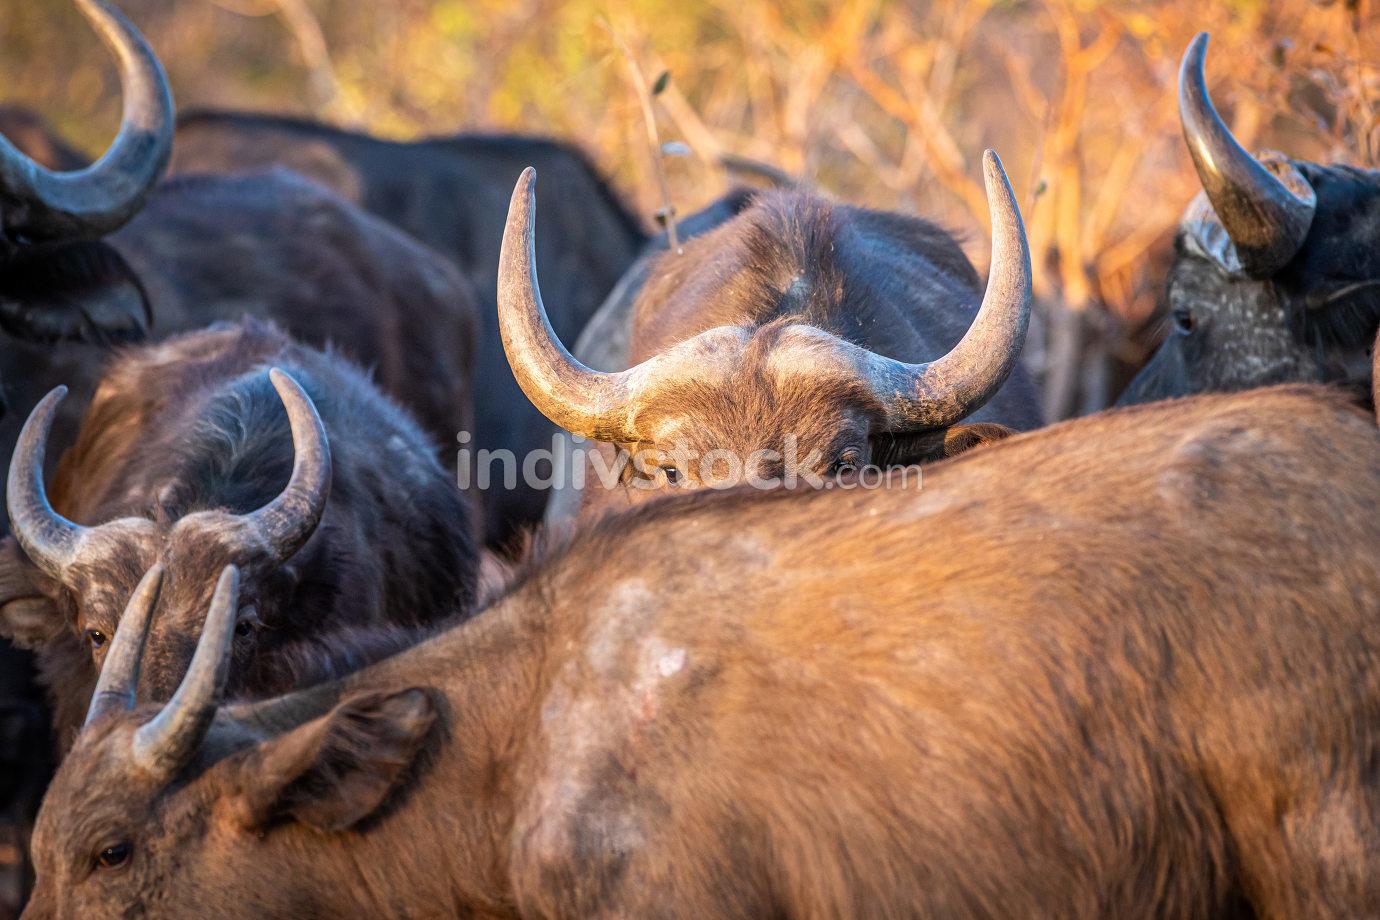 African buffalo hiding behind another buffalo.